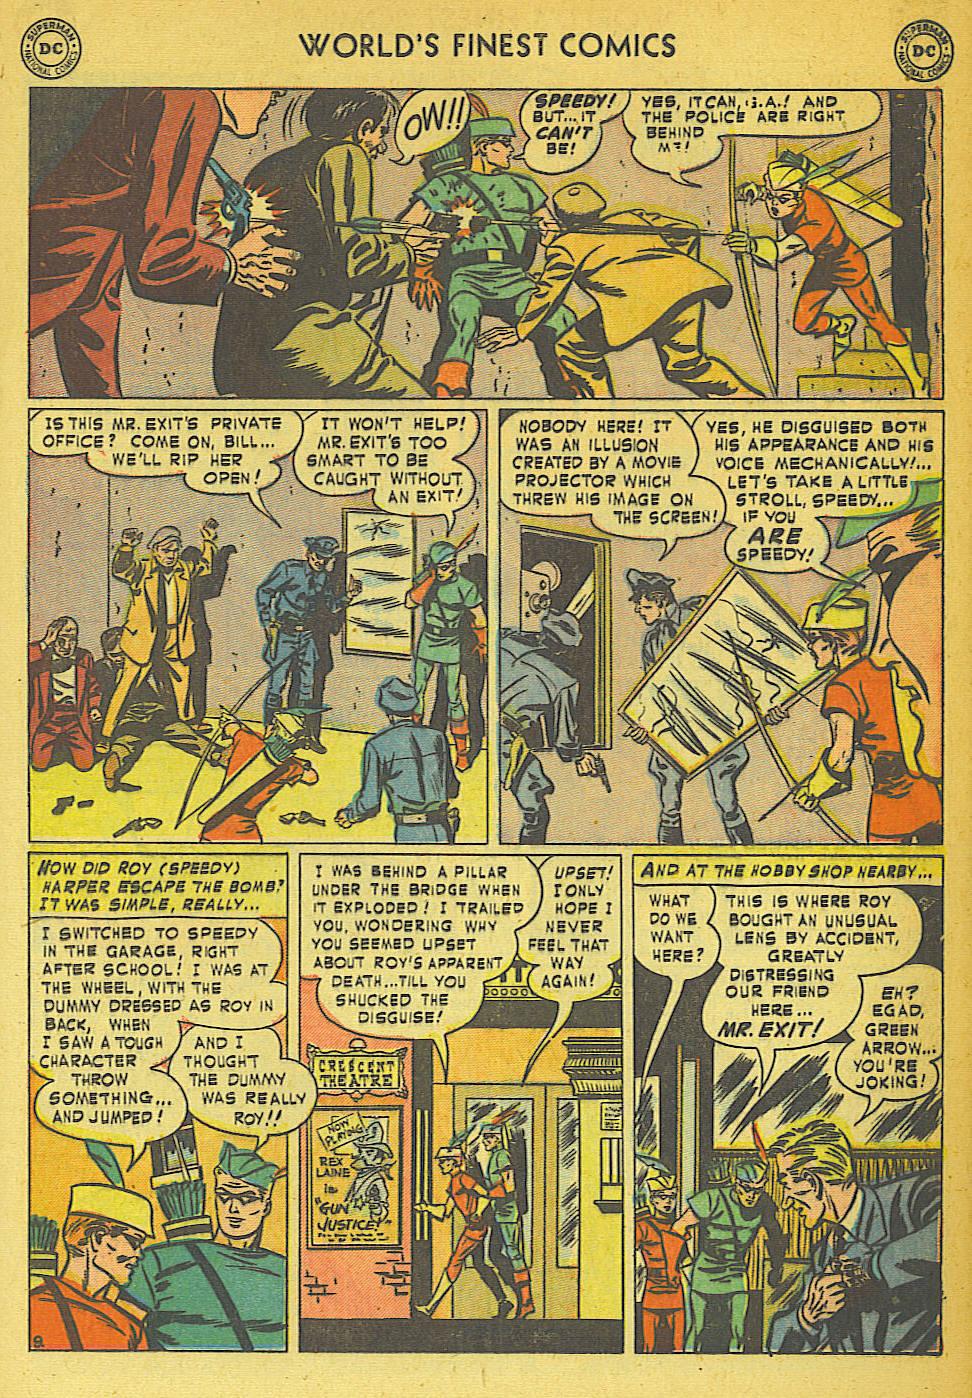 Read online World's Finest Comics comic -  Issue #57 - 25